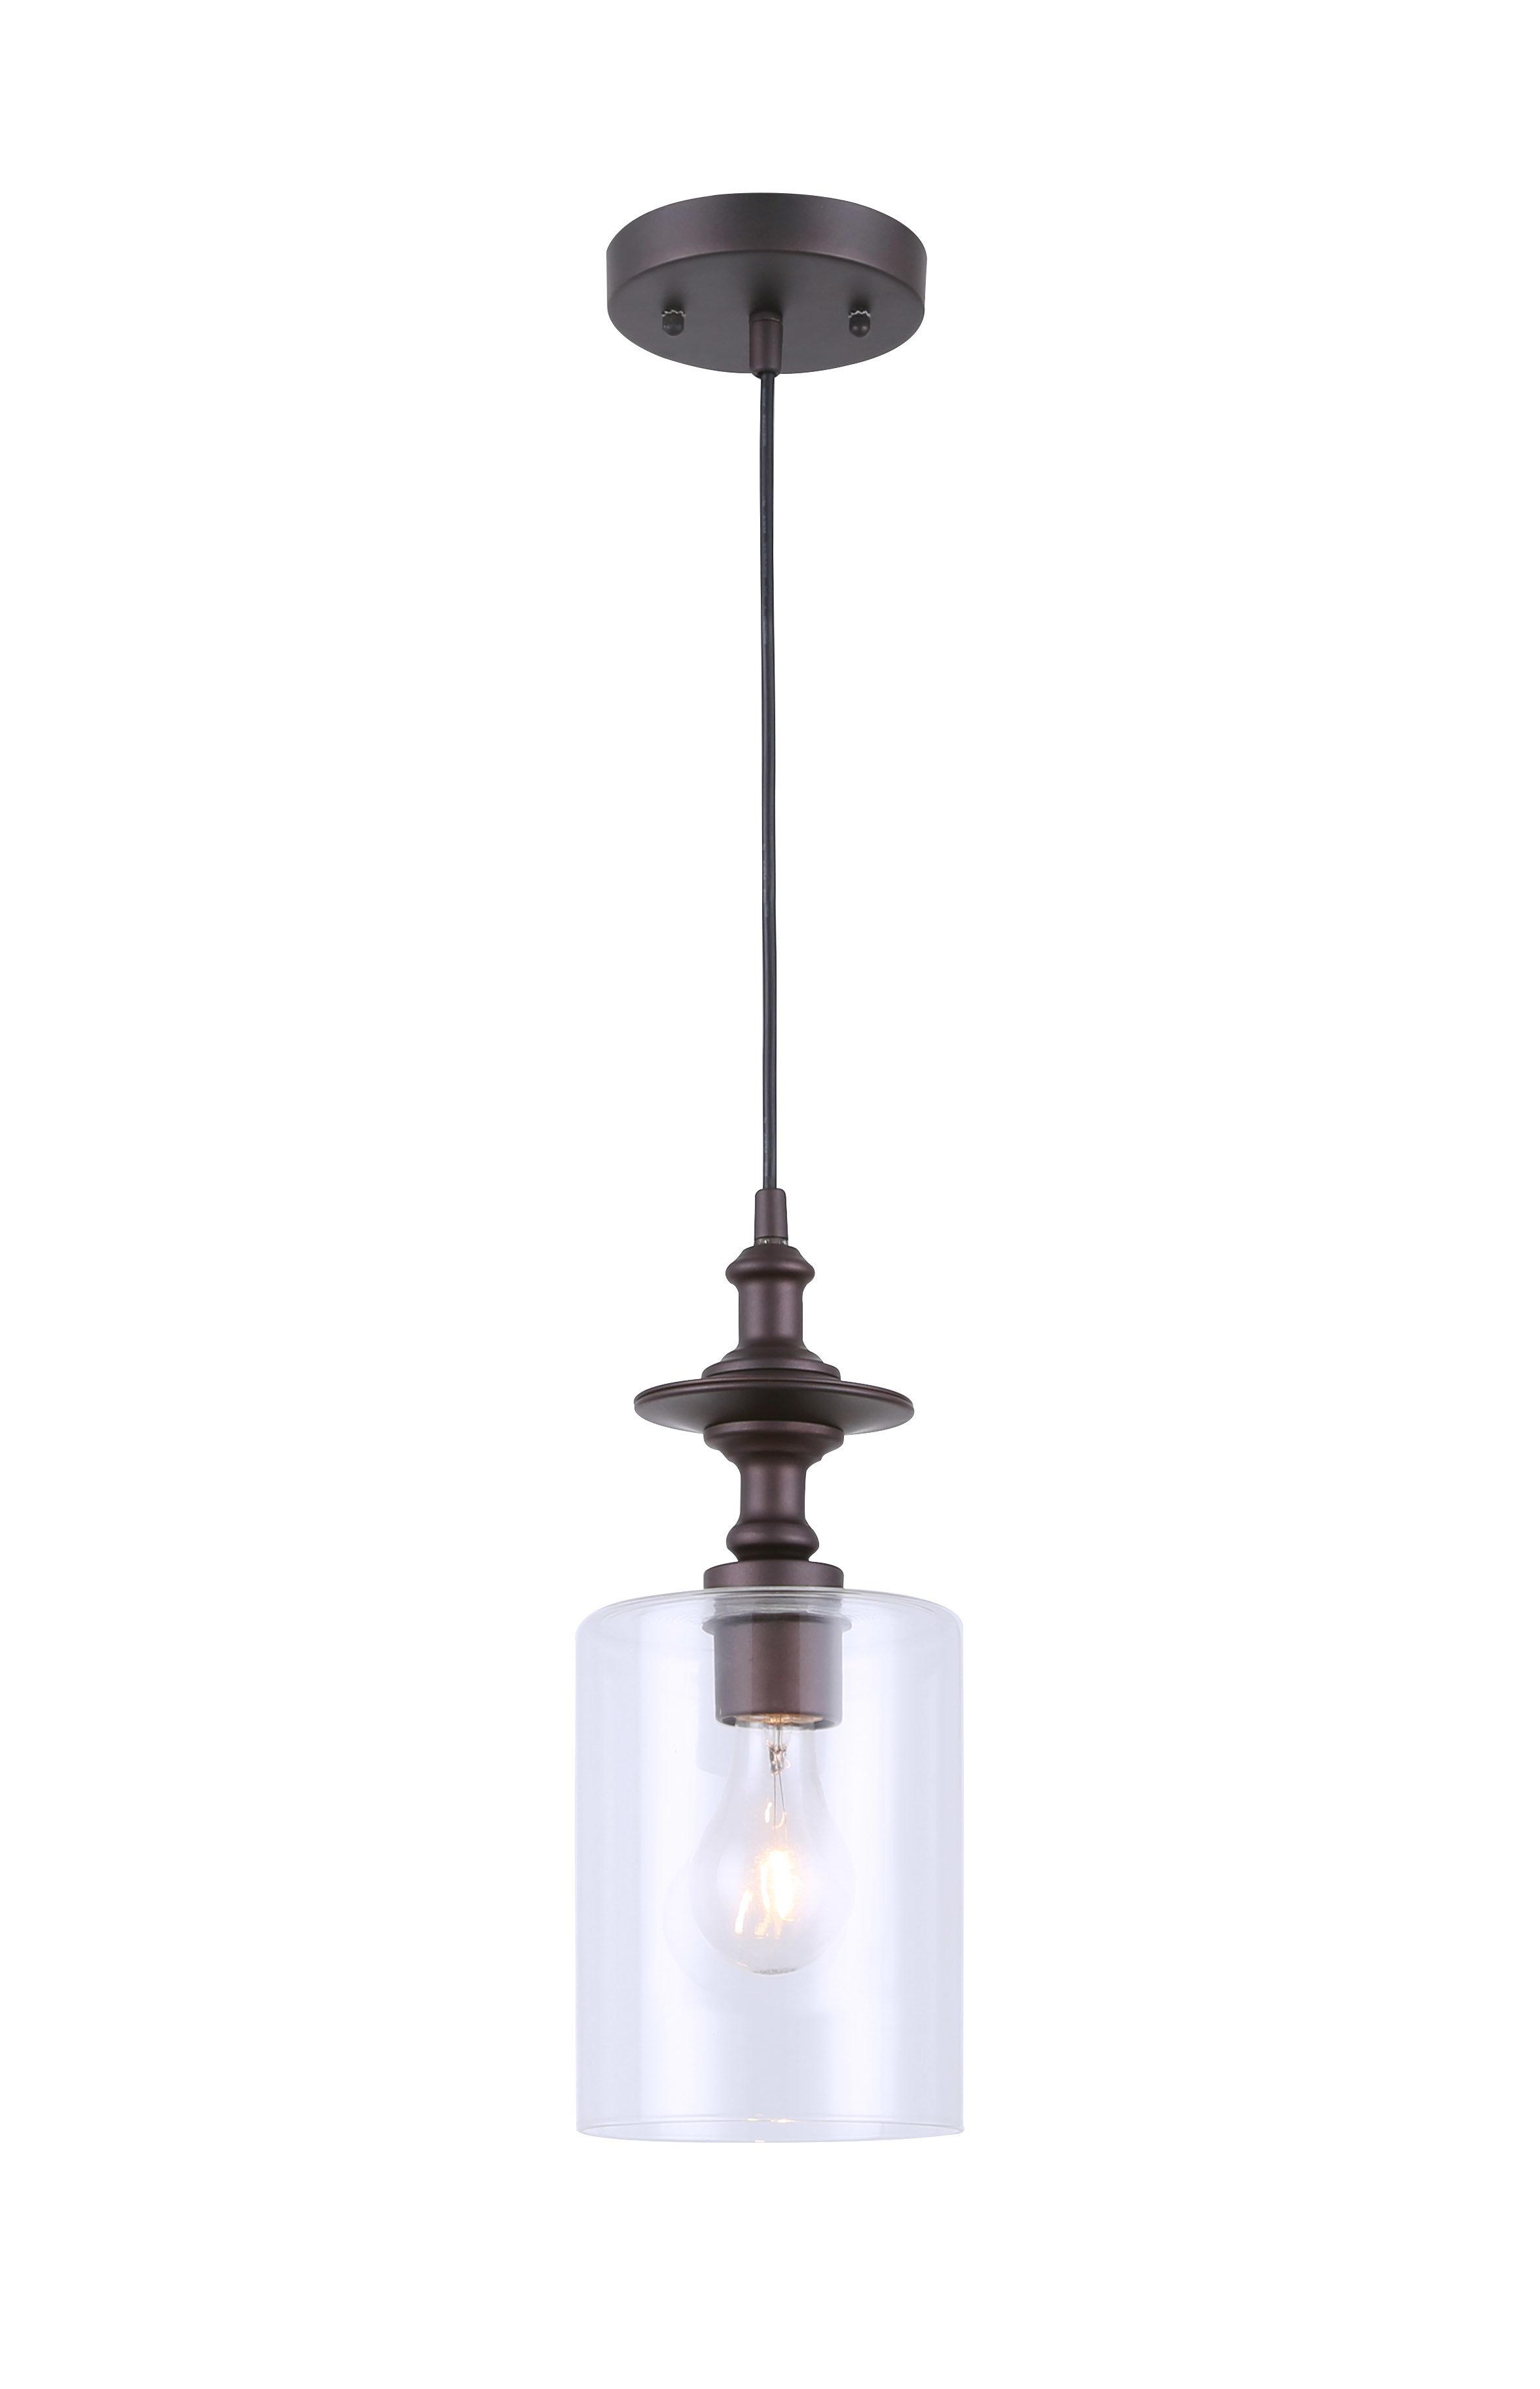 Farmhouse & Rustic Clear/glass Shade Pendants | Birch Lane Regarding Hurst 1 Light Single Cylinder Pendants (View 19 of 30)